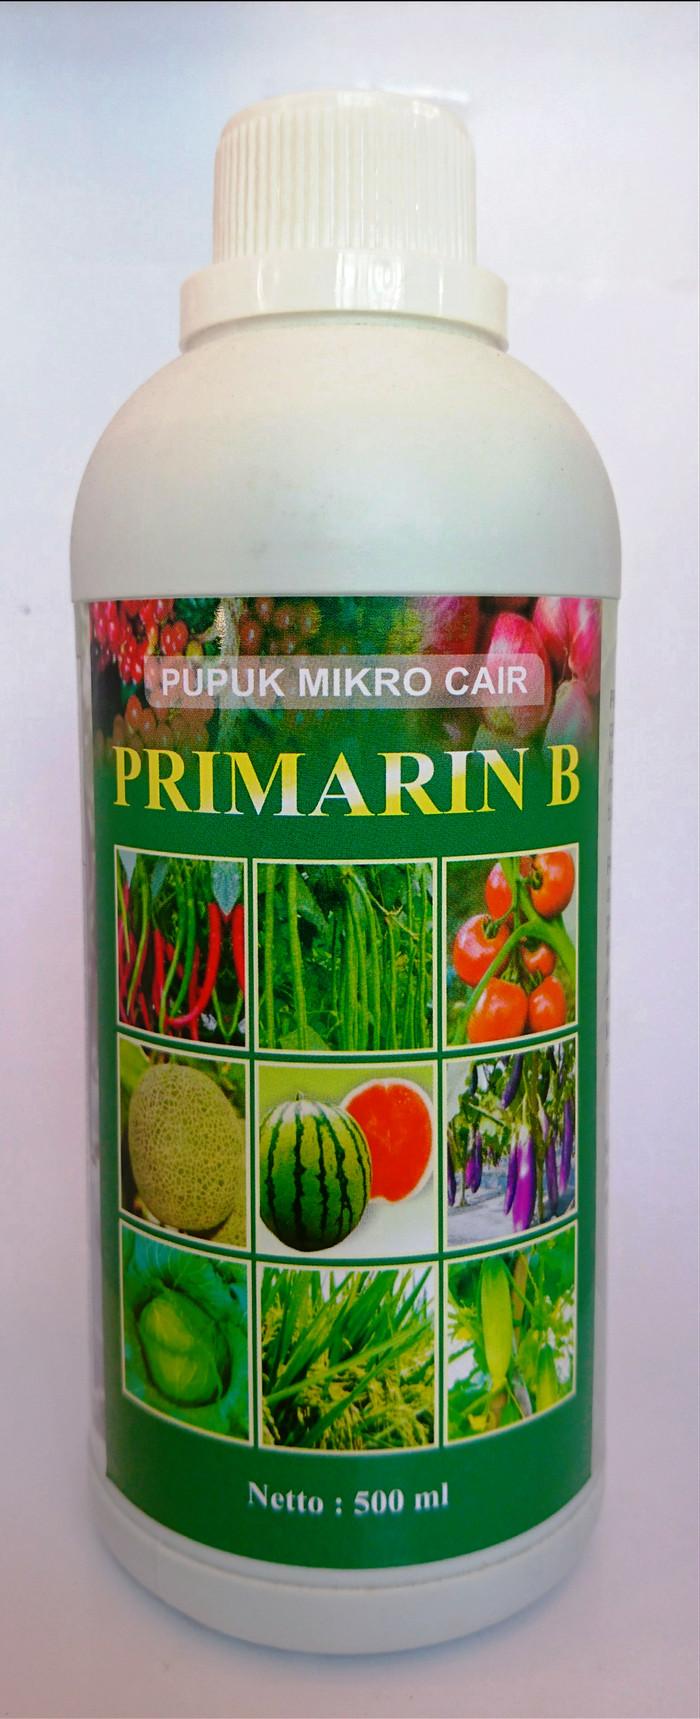 Foto Produk Pupuk Mikro PRIMARIN B 500ml dari wb mubarak sembada